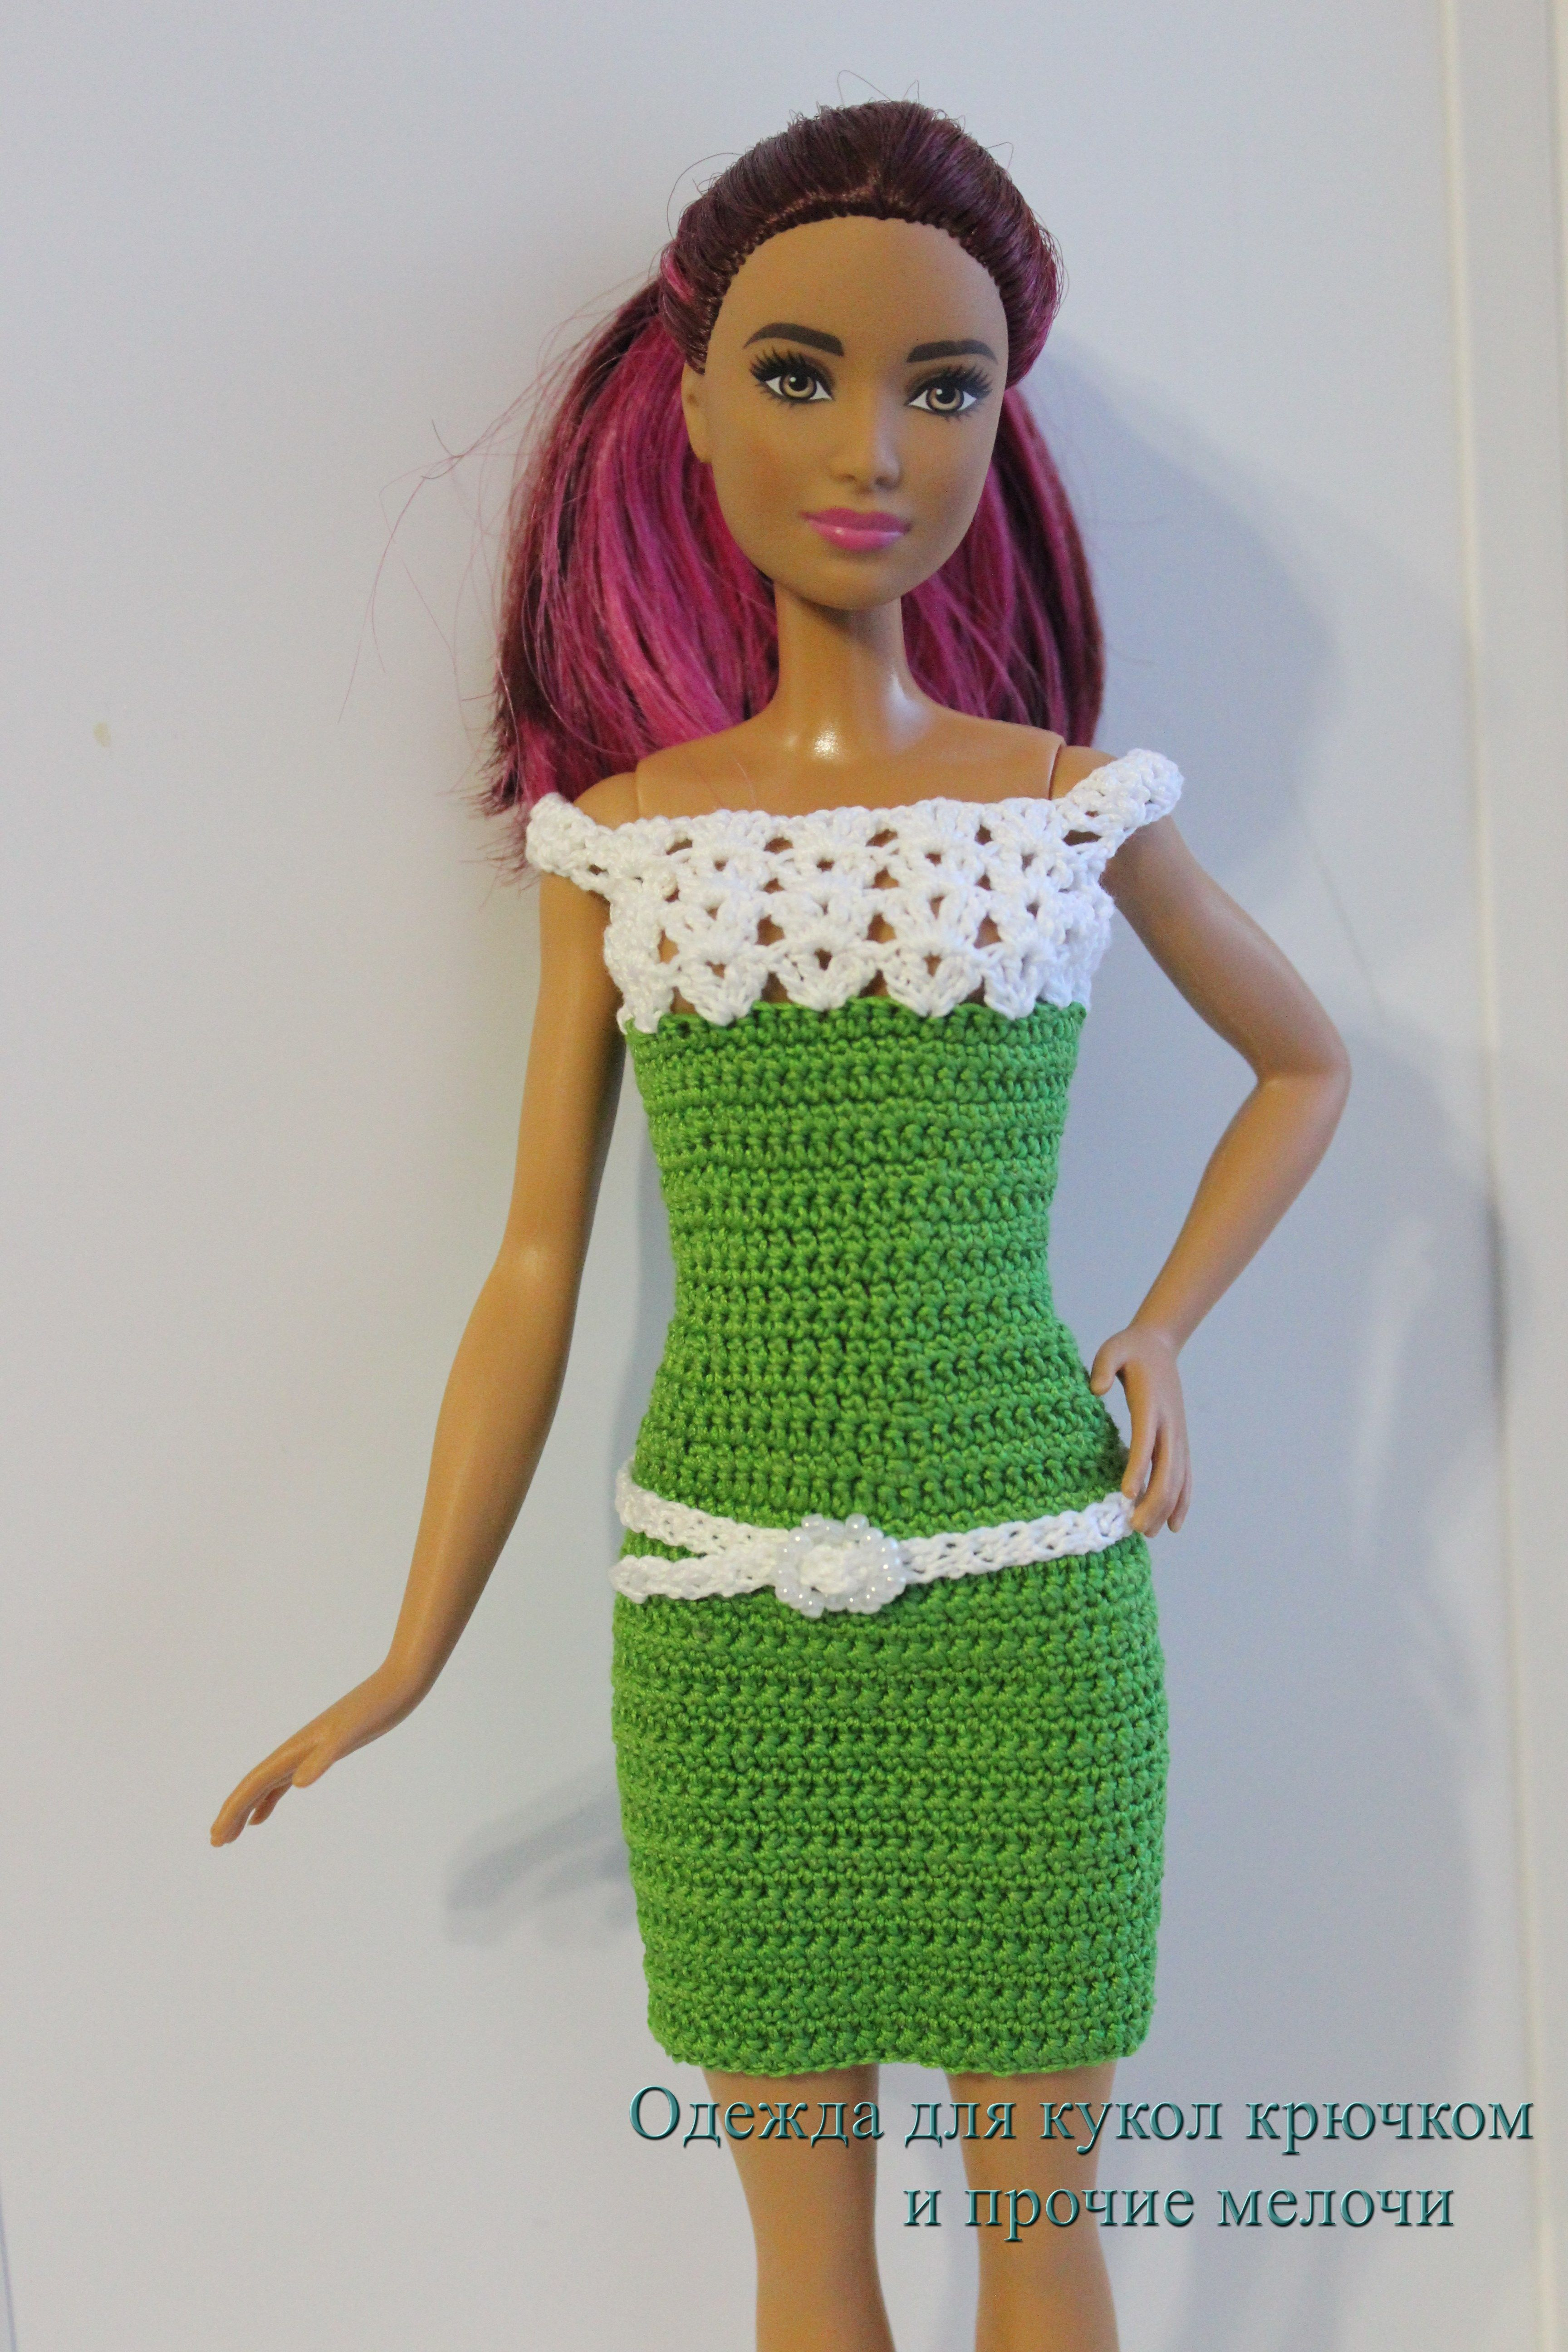 Crotchet dress for Barbie | Barbie | Pinterest | Crotchet, Dolls and ...